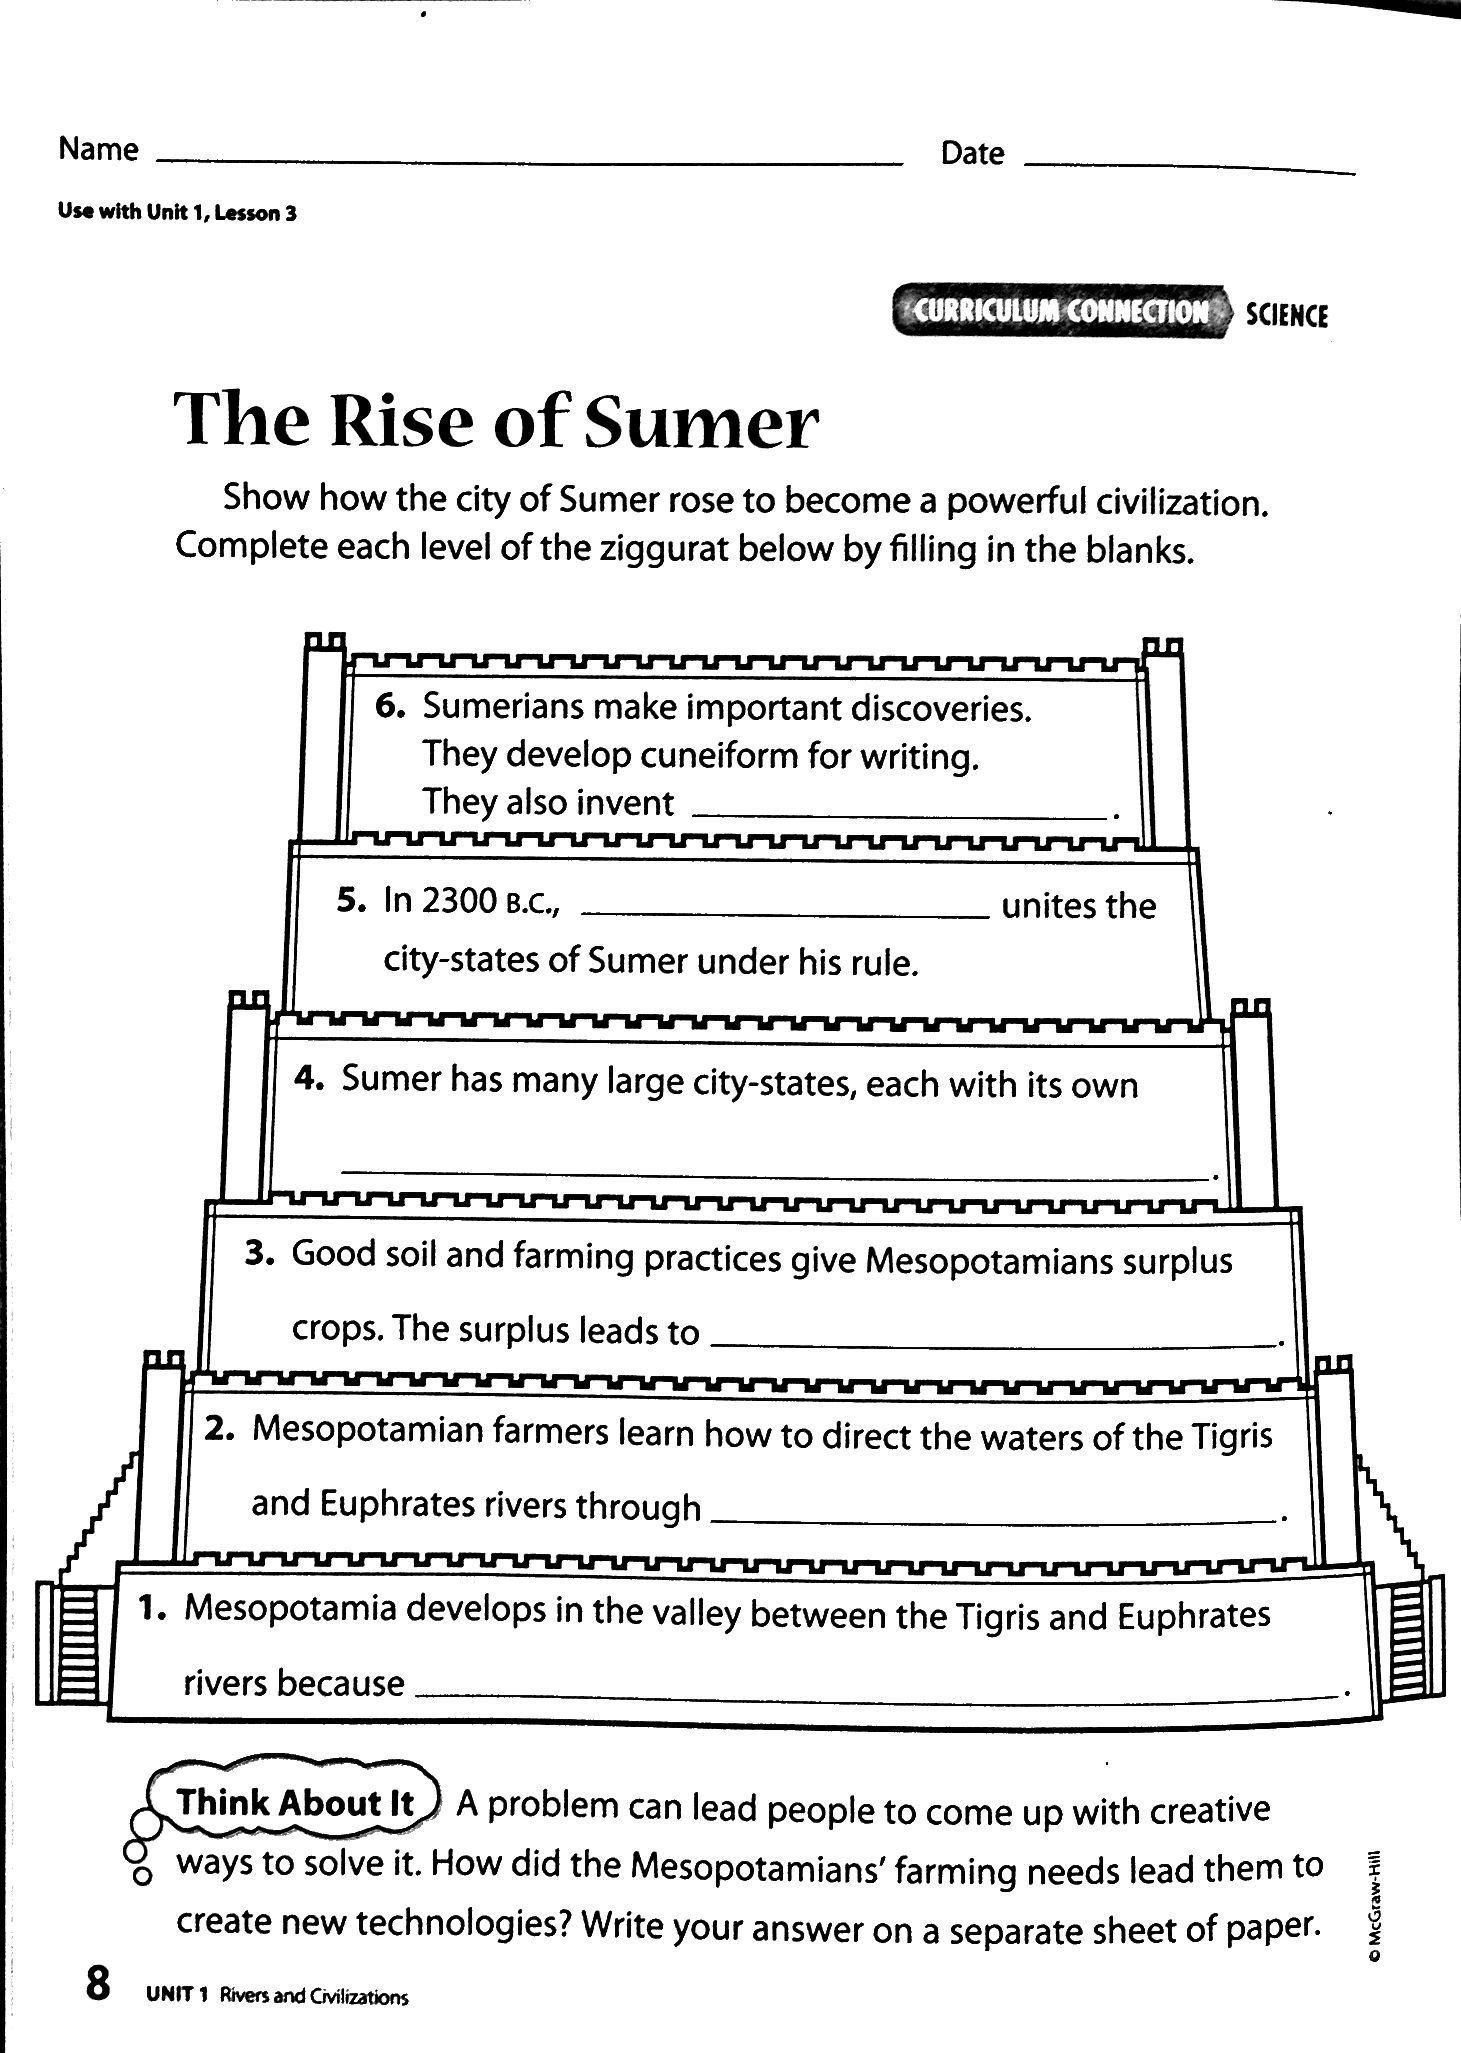 medium resolution of the-rise-of-sumer.jpg 1